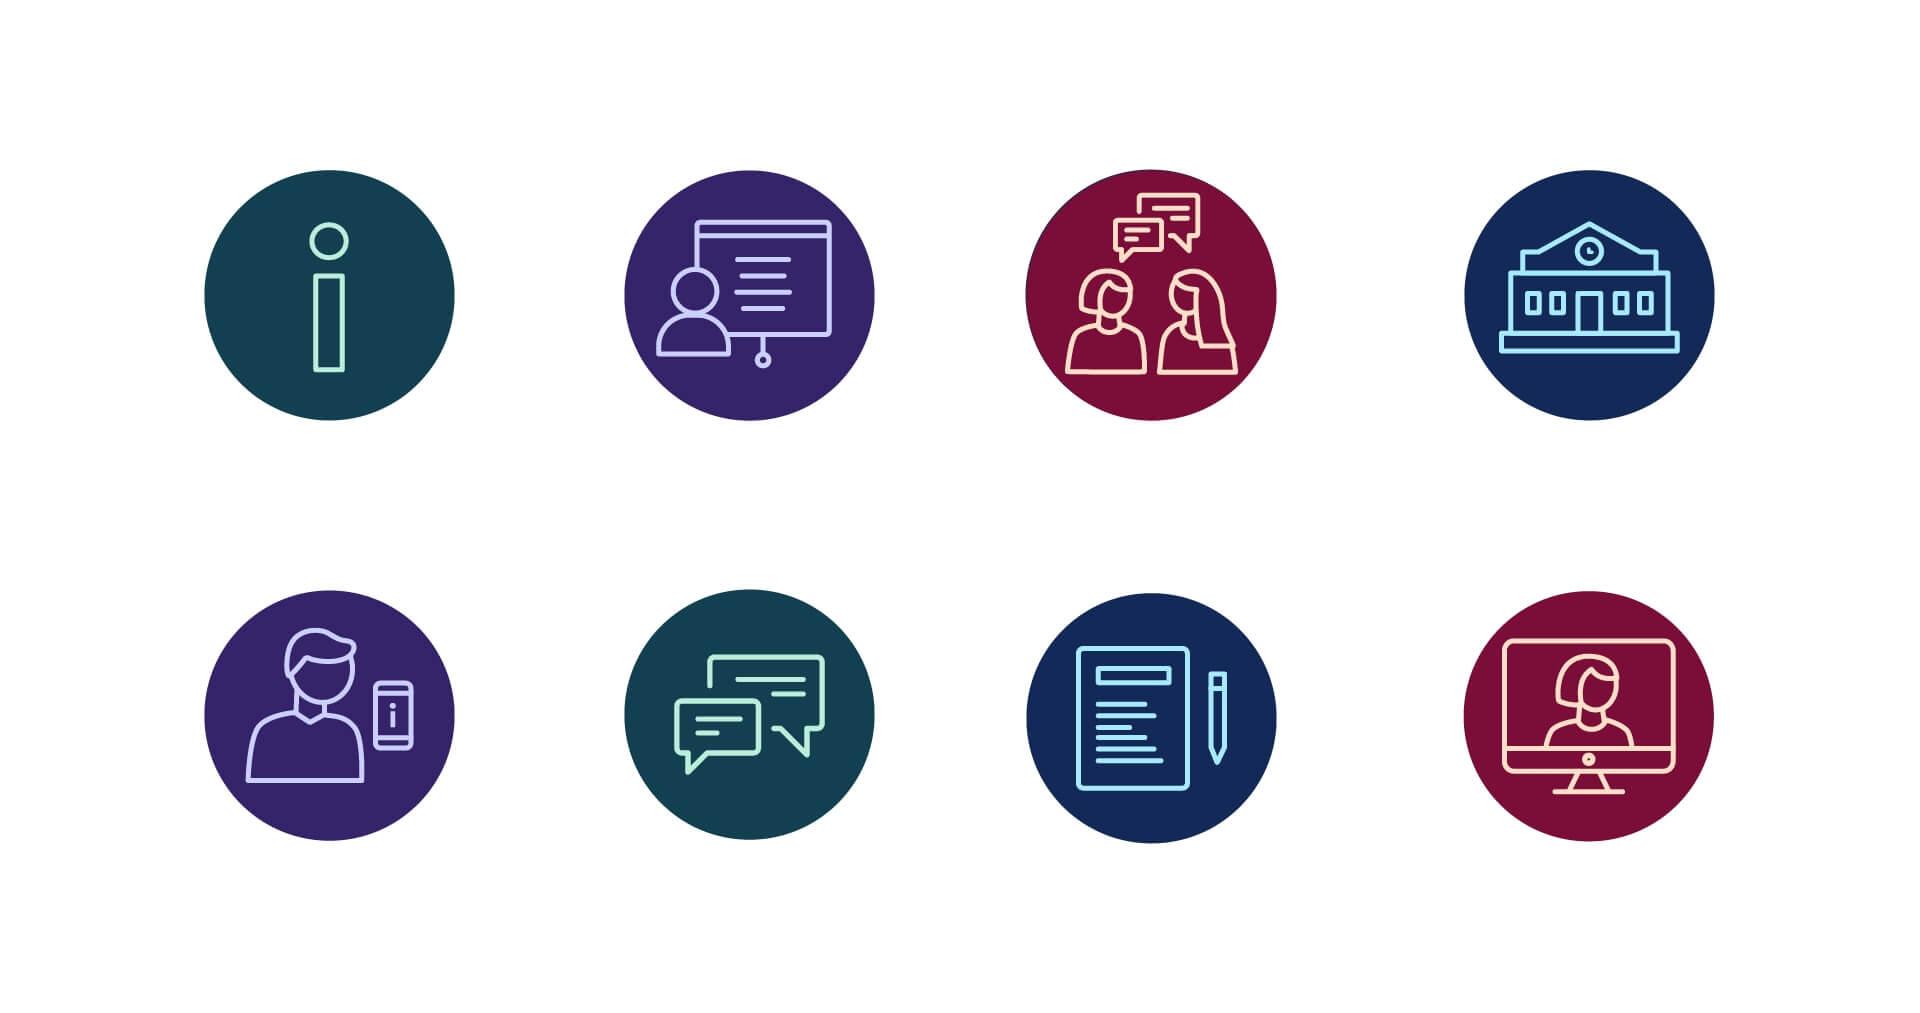 studio-malagon-mit-teaching-systems-lab-icons